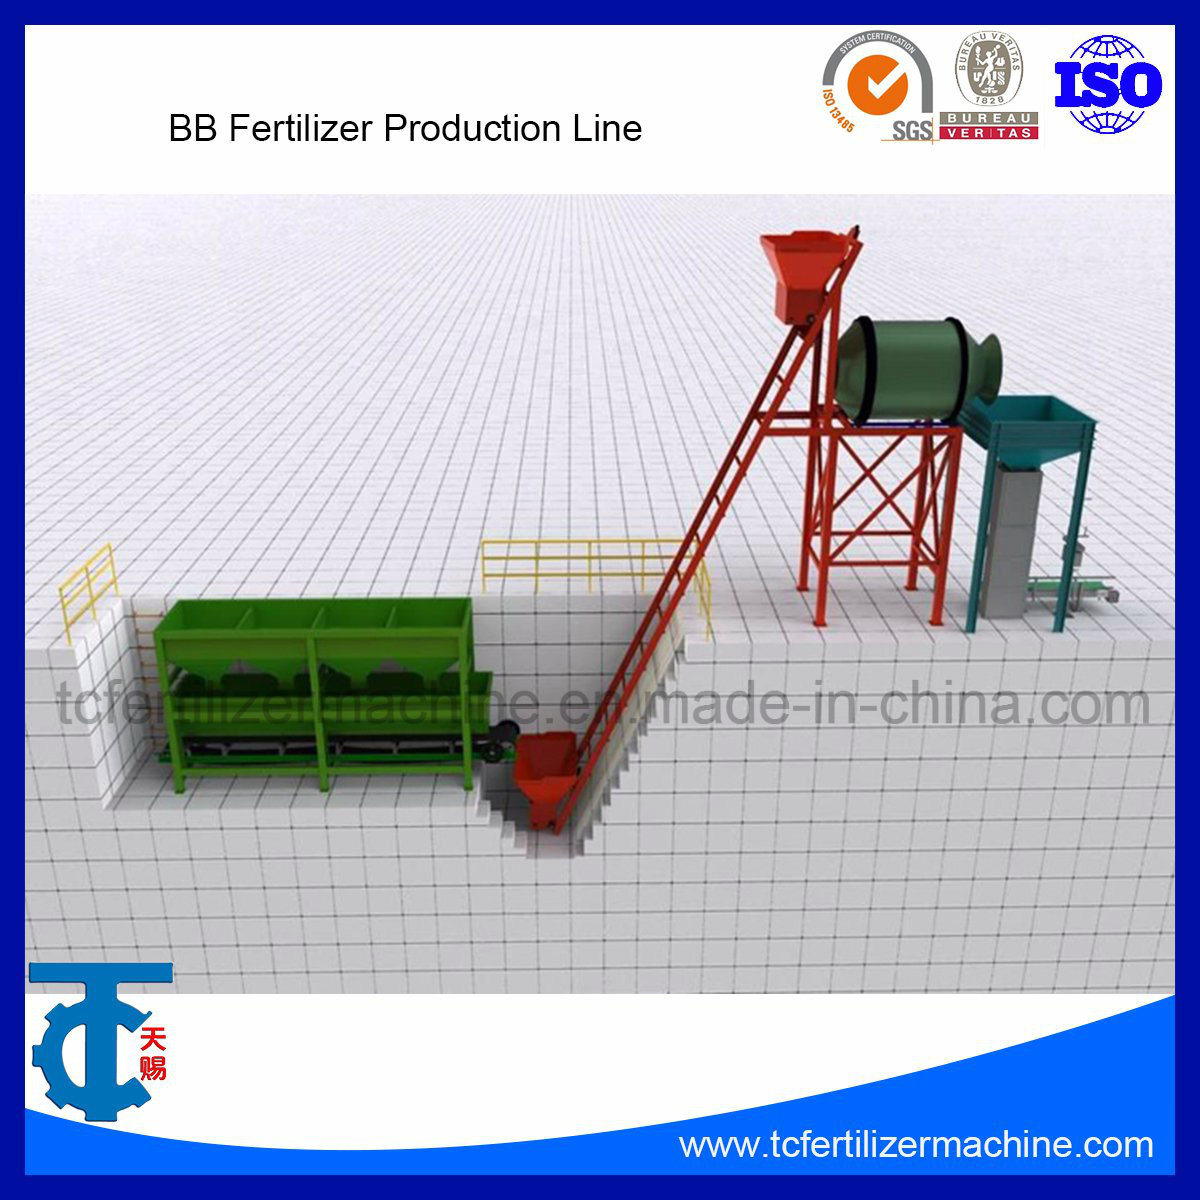 China Bb/Bulk Blending Fertilizer Equipment Used in Mixing Production Line  - China NPK Mixer Machine, Bb Mixer Machine